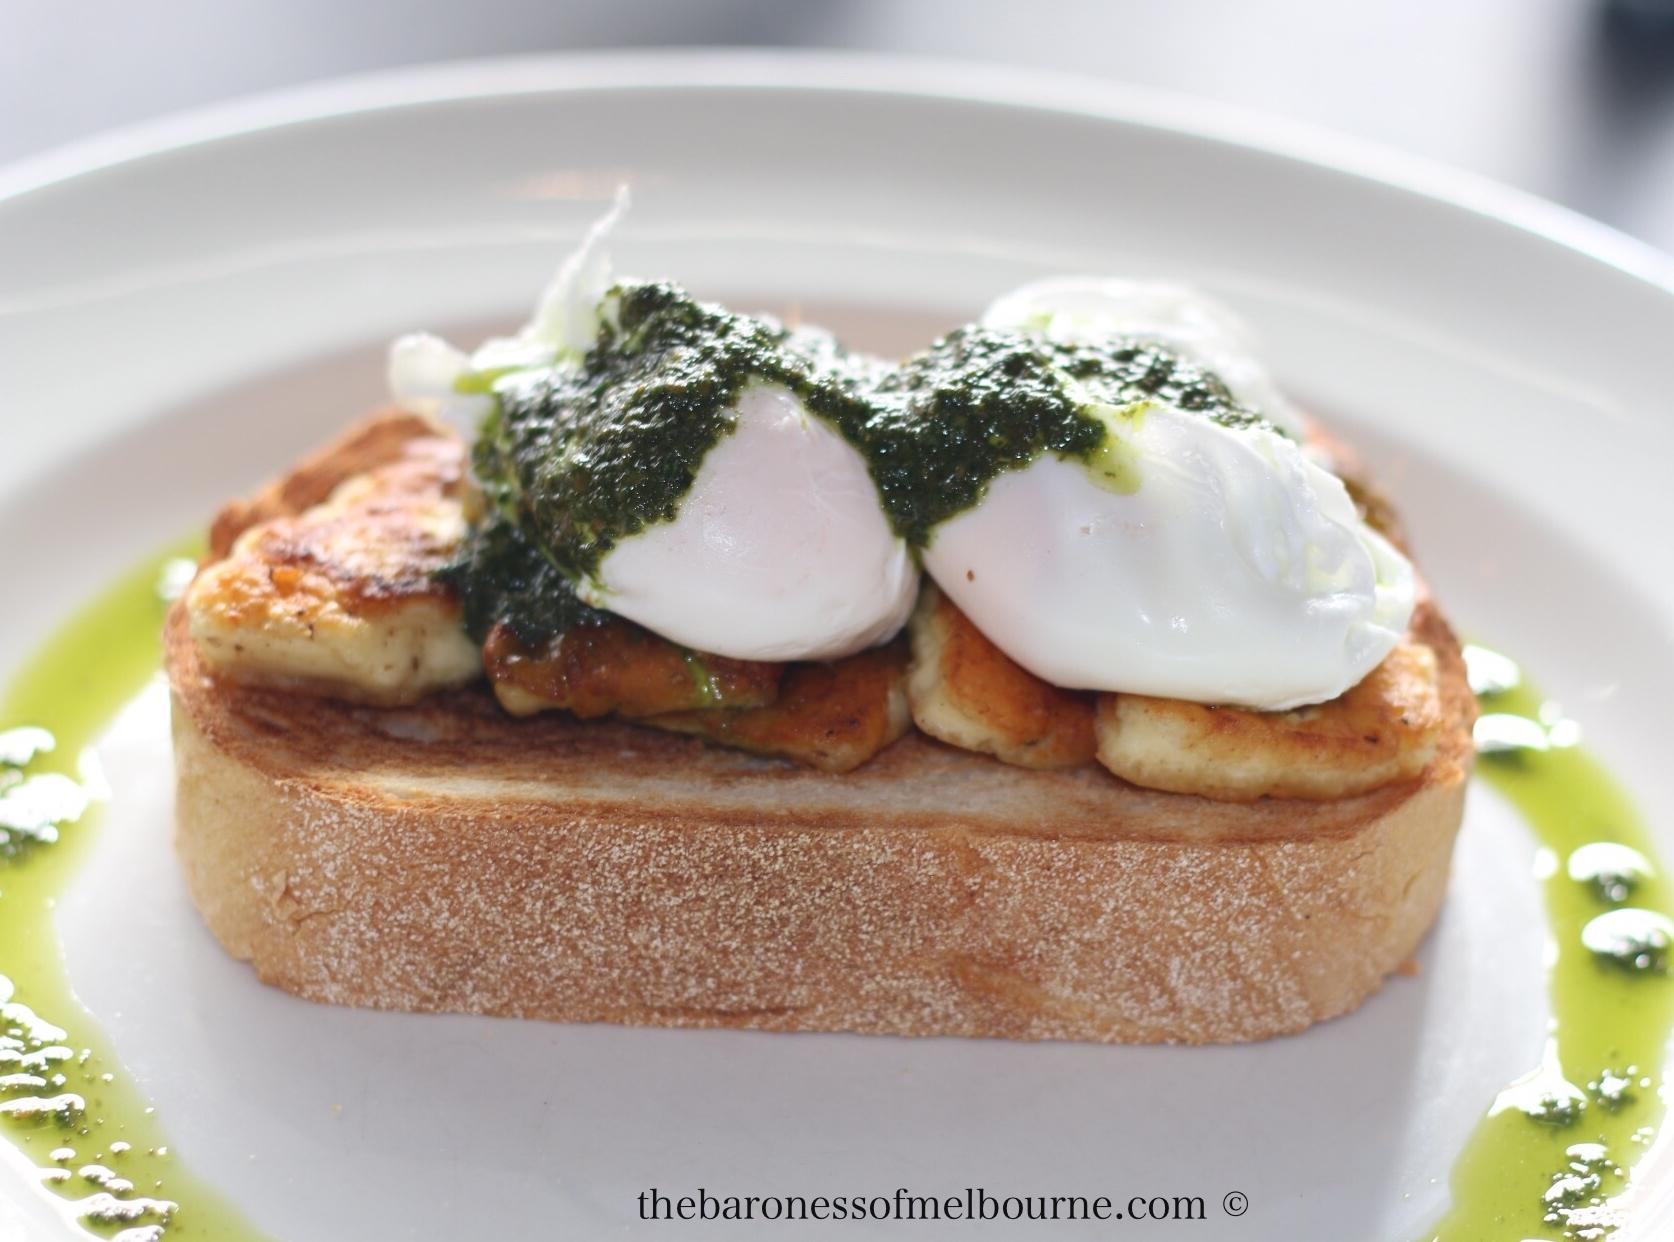 Haloumi on sour dough with poached eggs and basil pesto